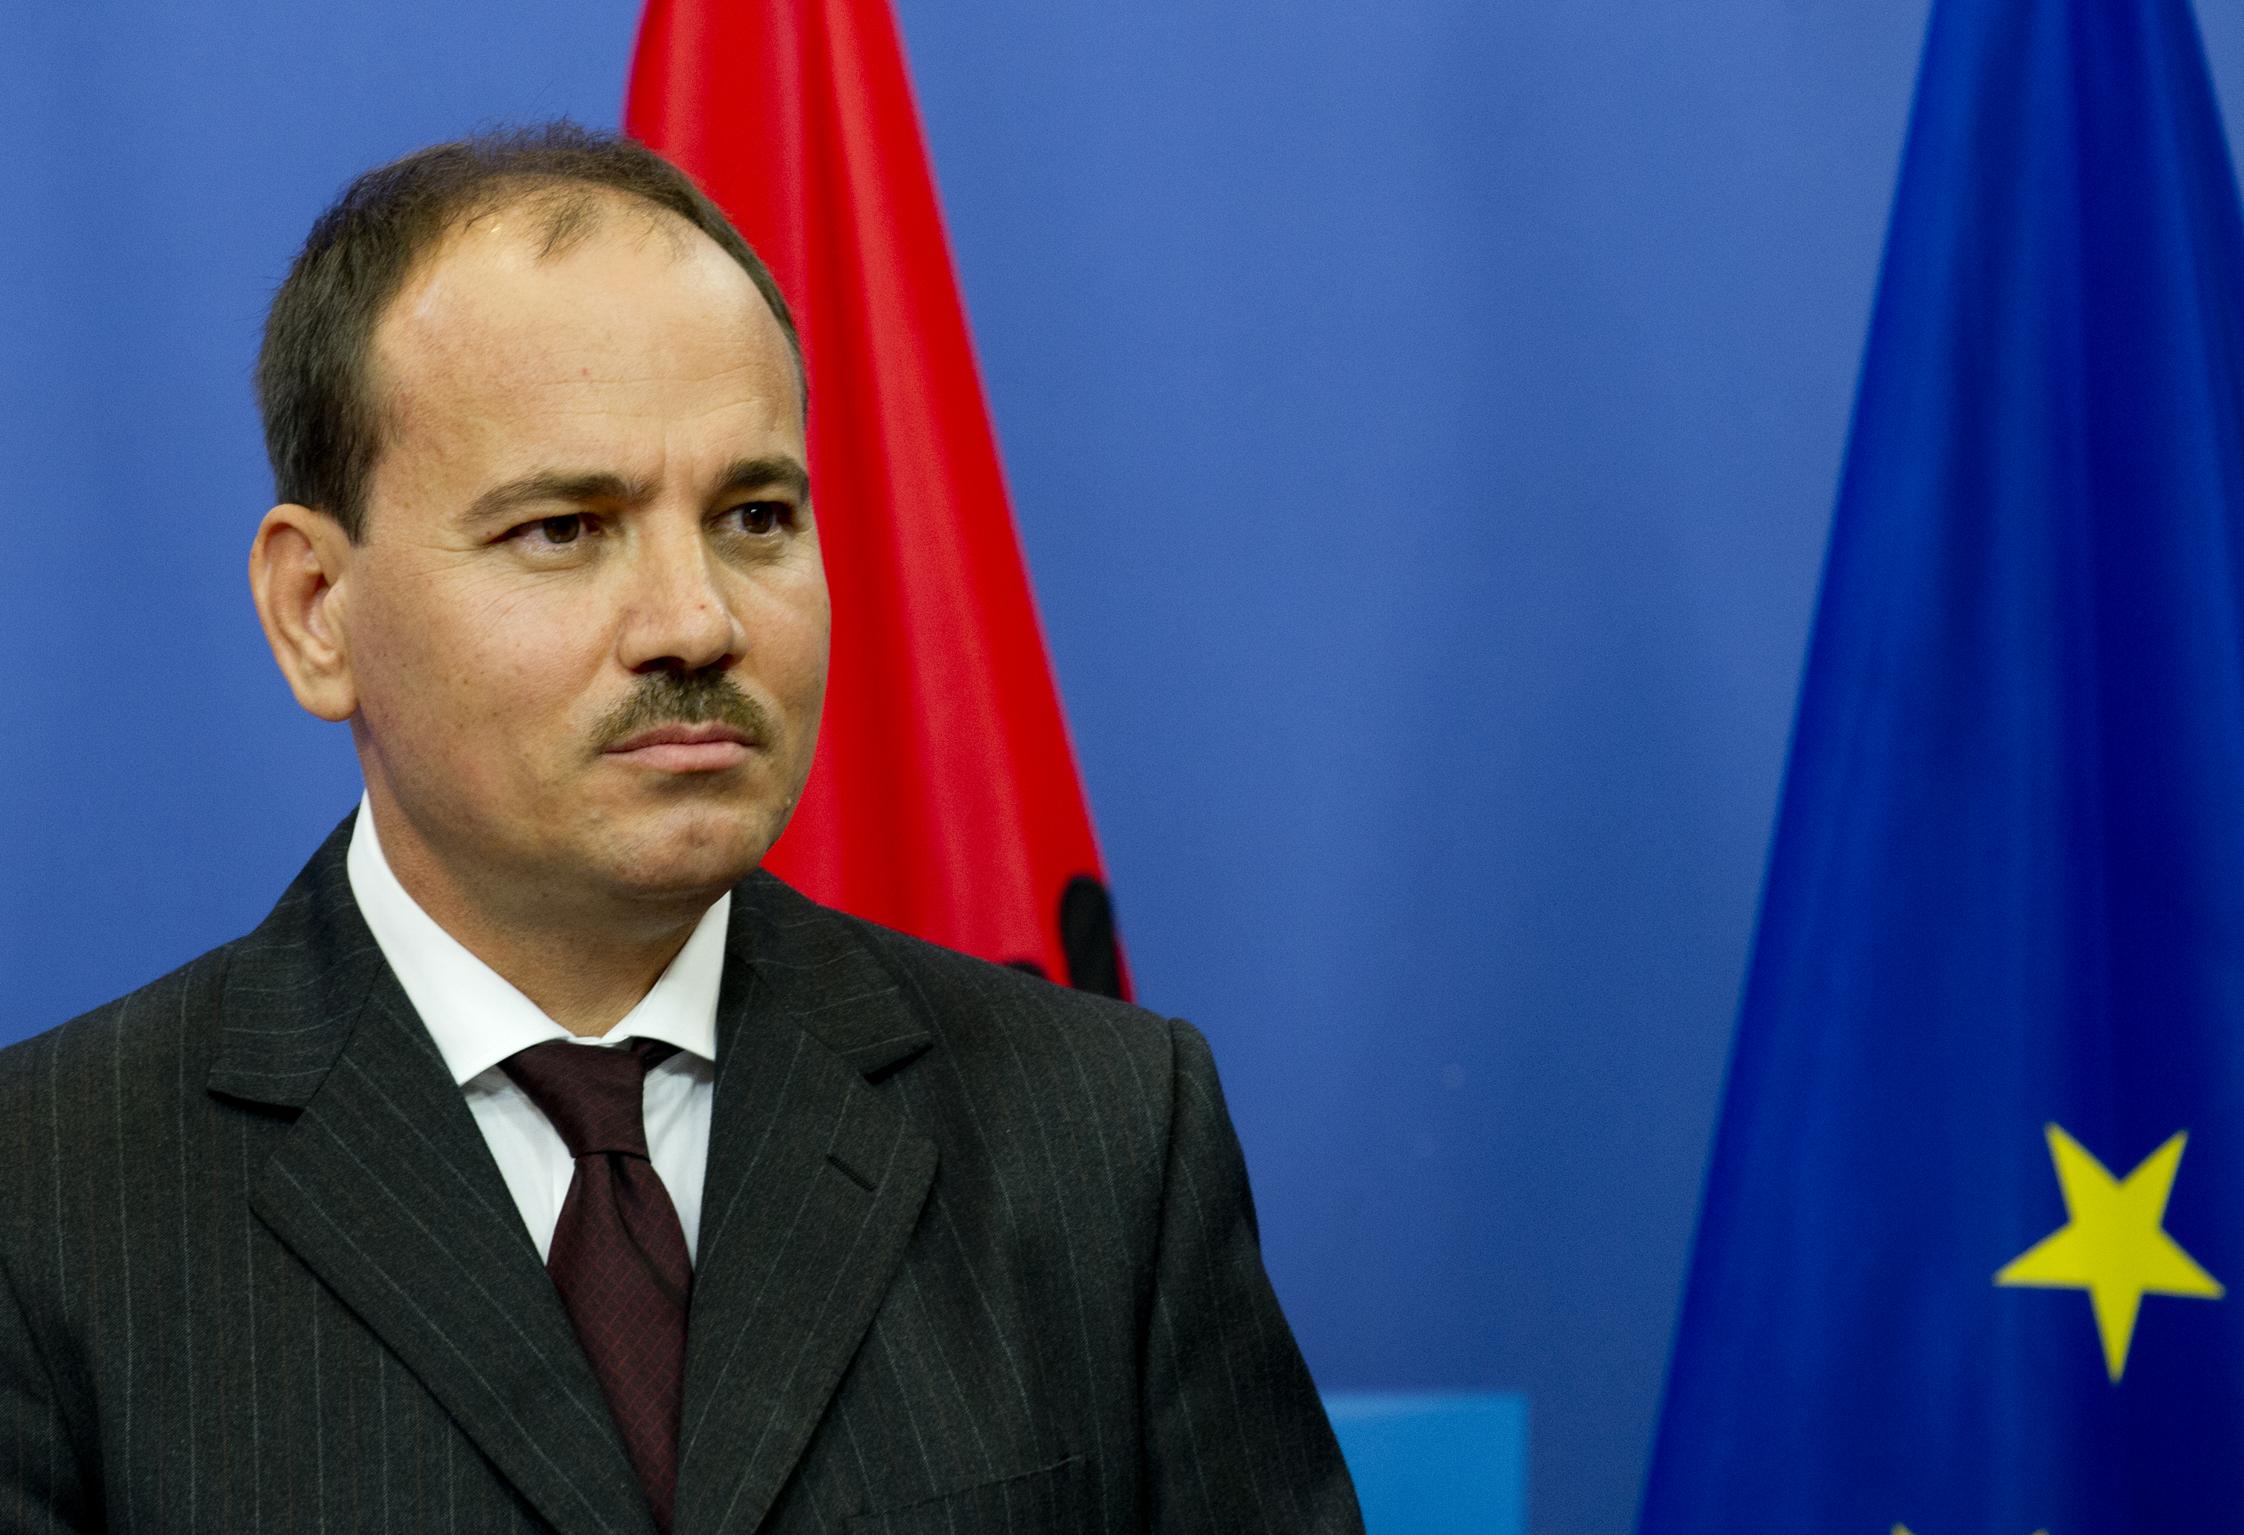 Le président albanais Bujar Nishani | Crédits photo -- The Council of the European Union